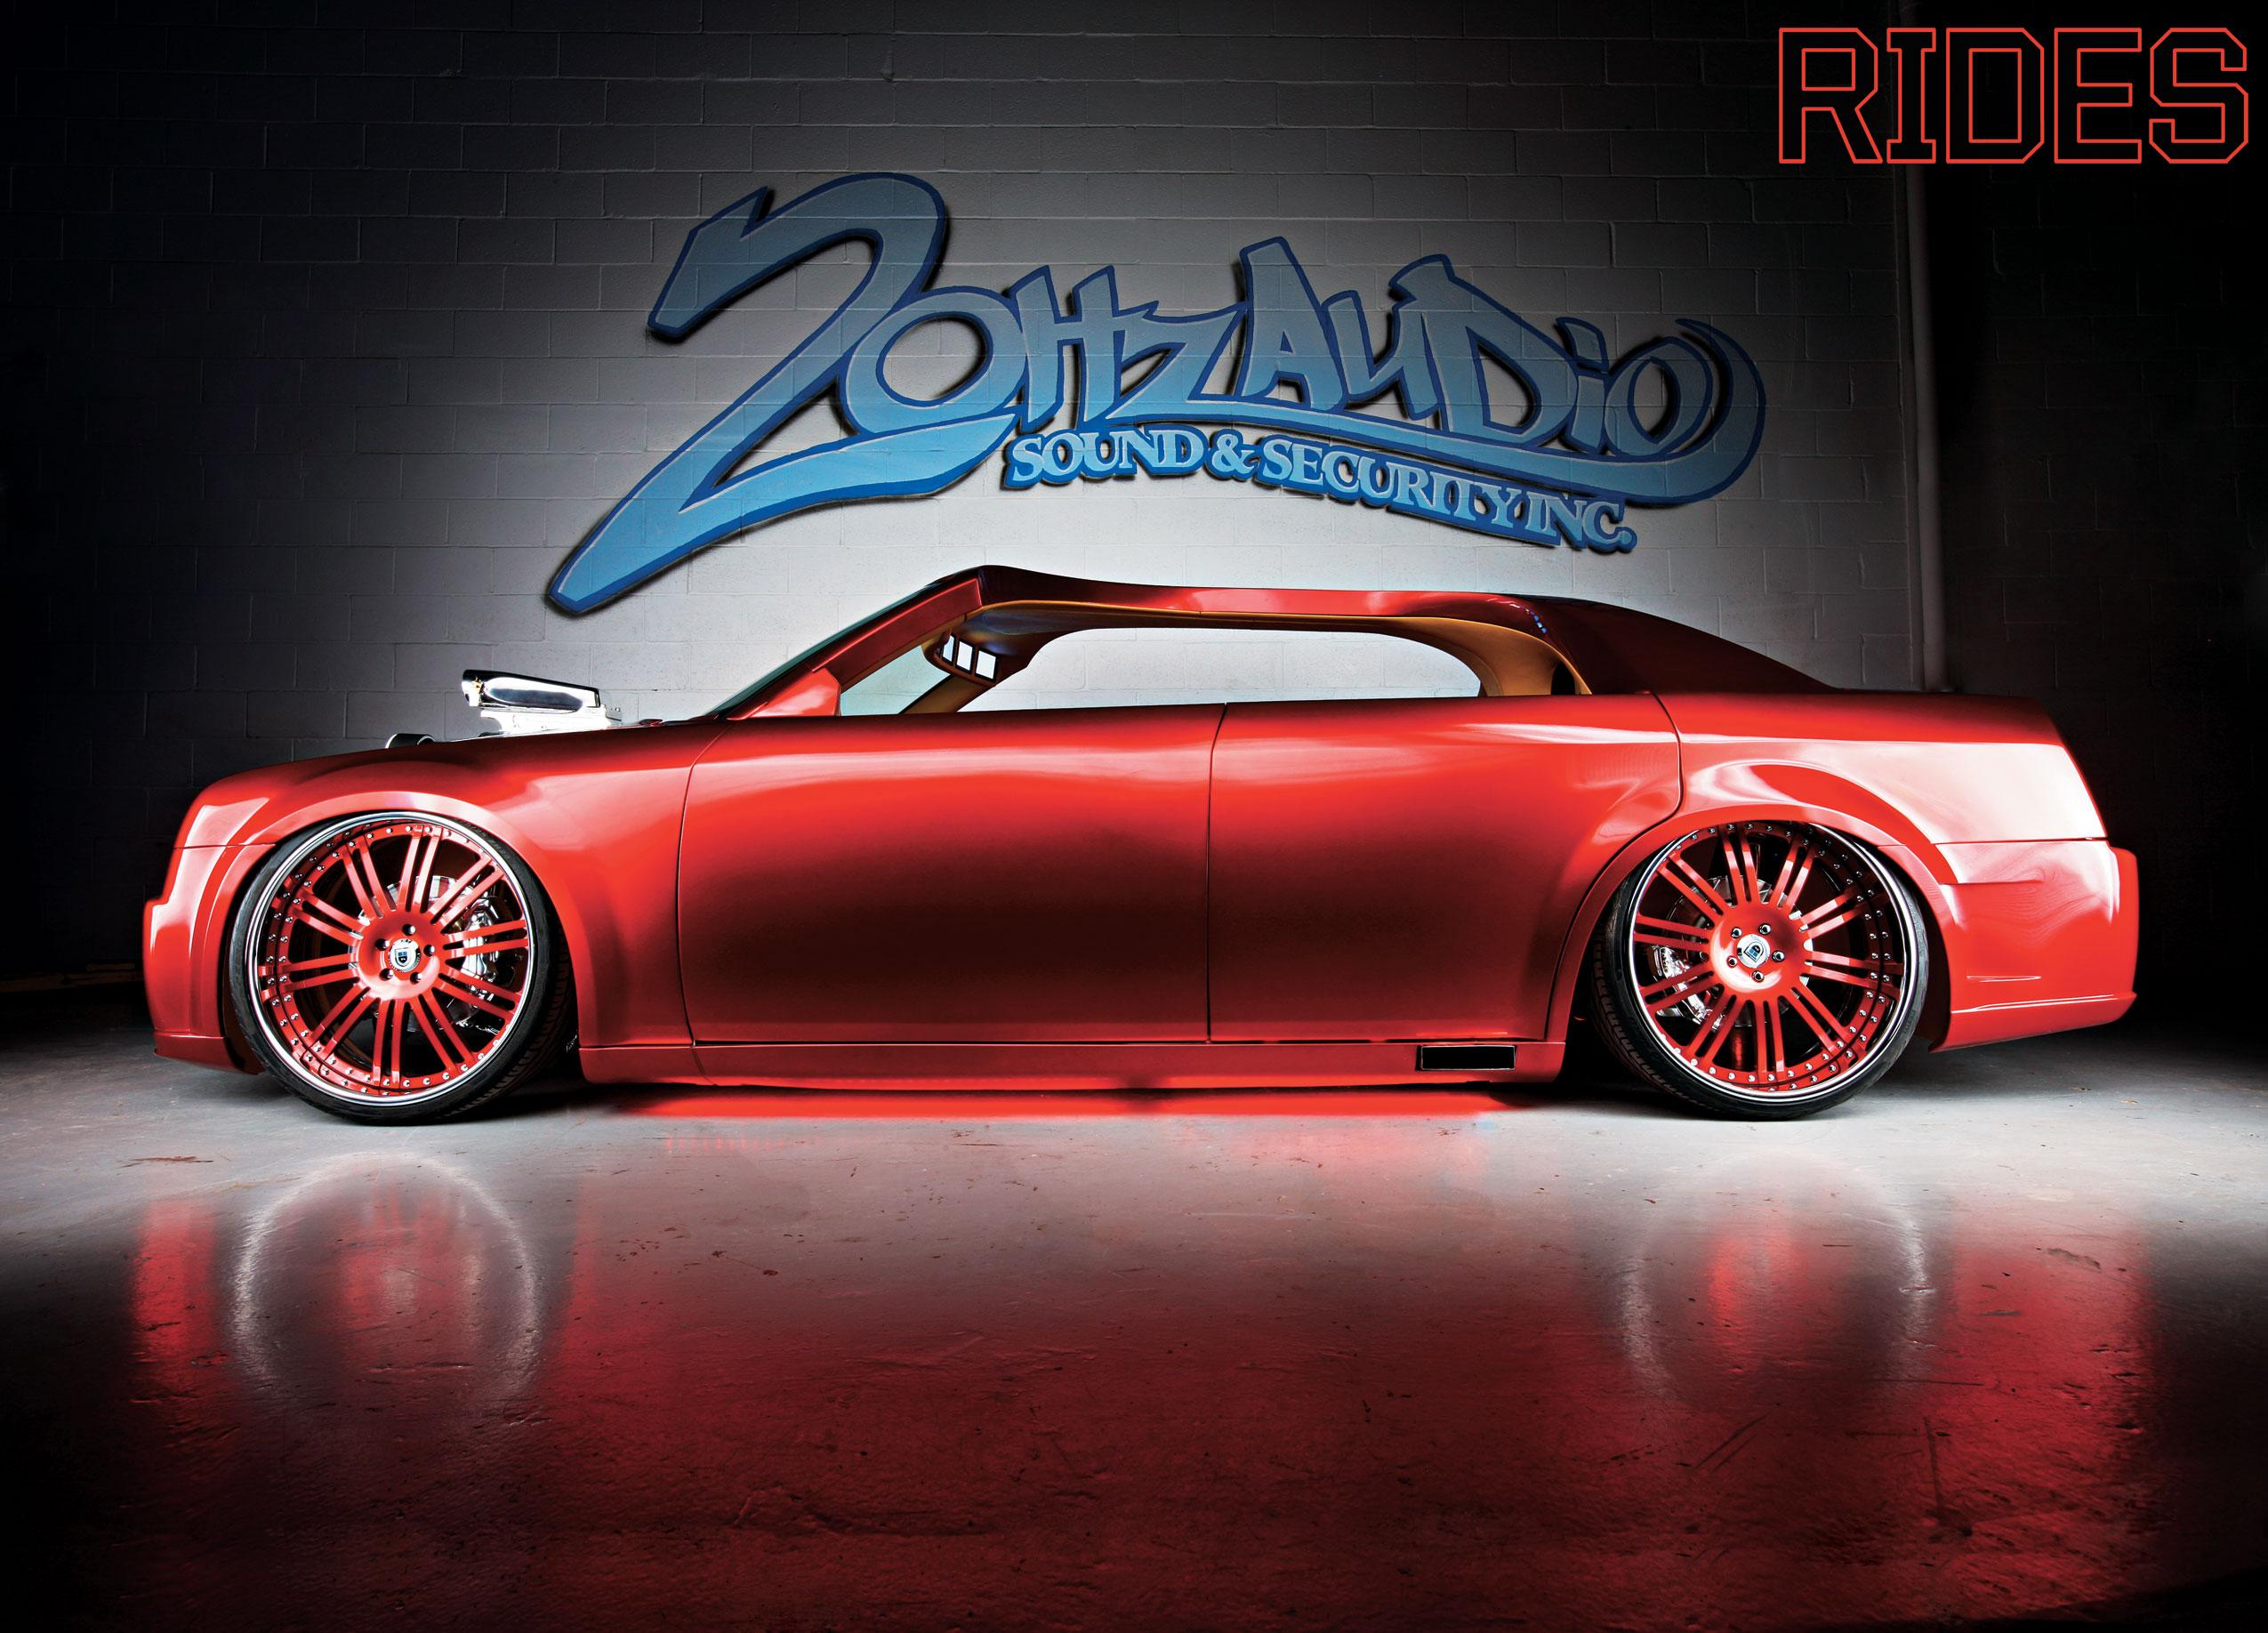 rides cars 2006 chrysler-300c-wallpaper